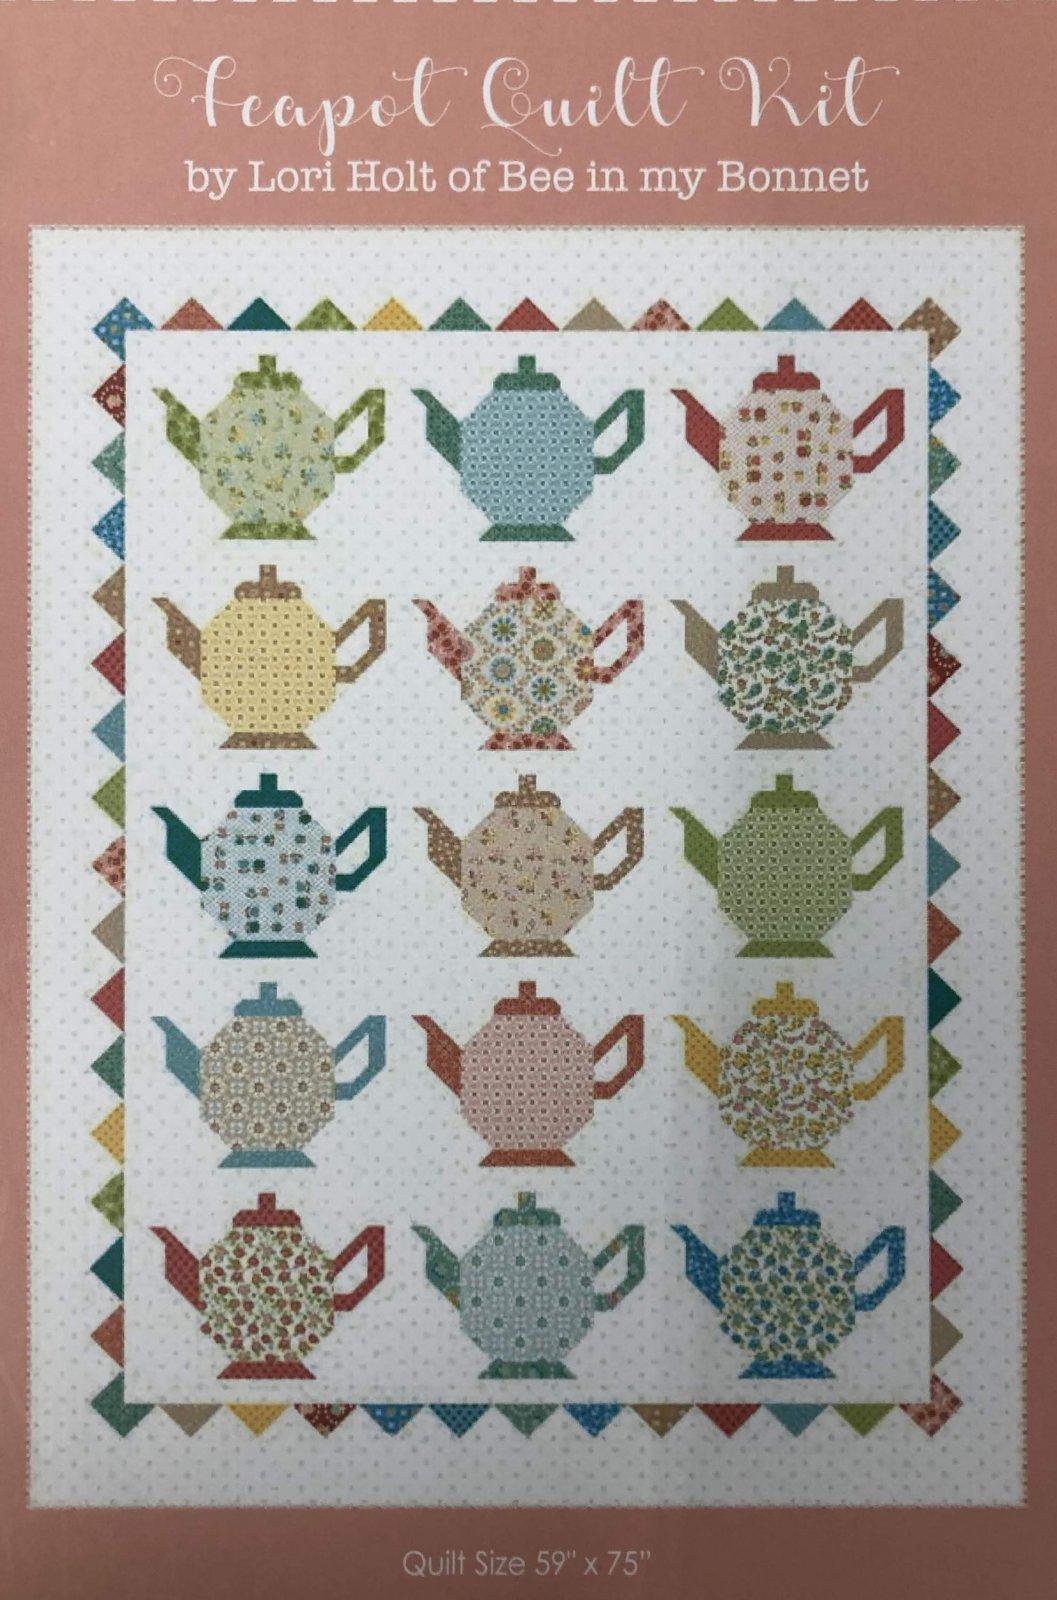 Teapot Quilt Kit by Lori Holt